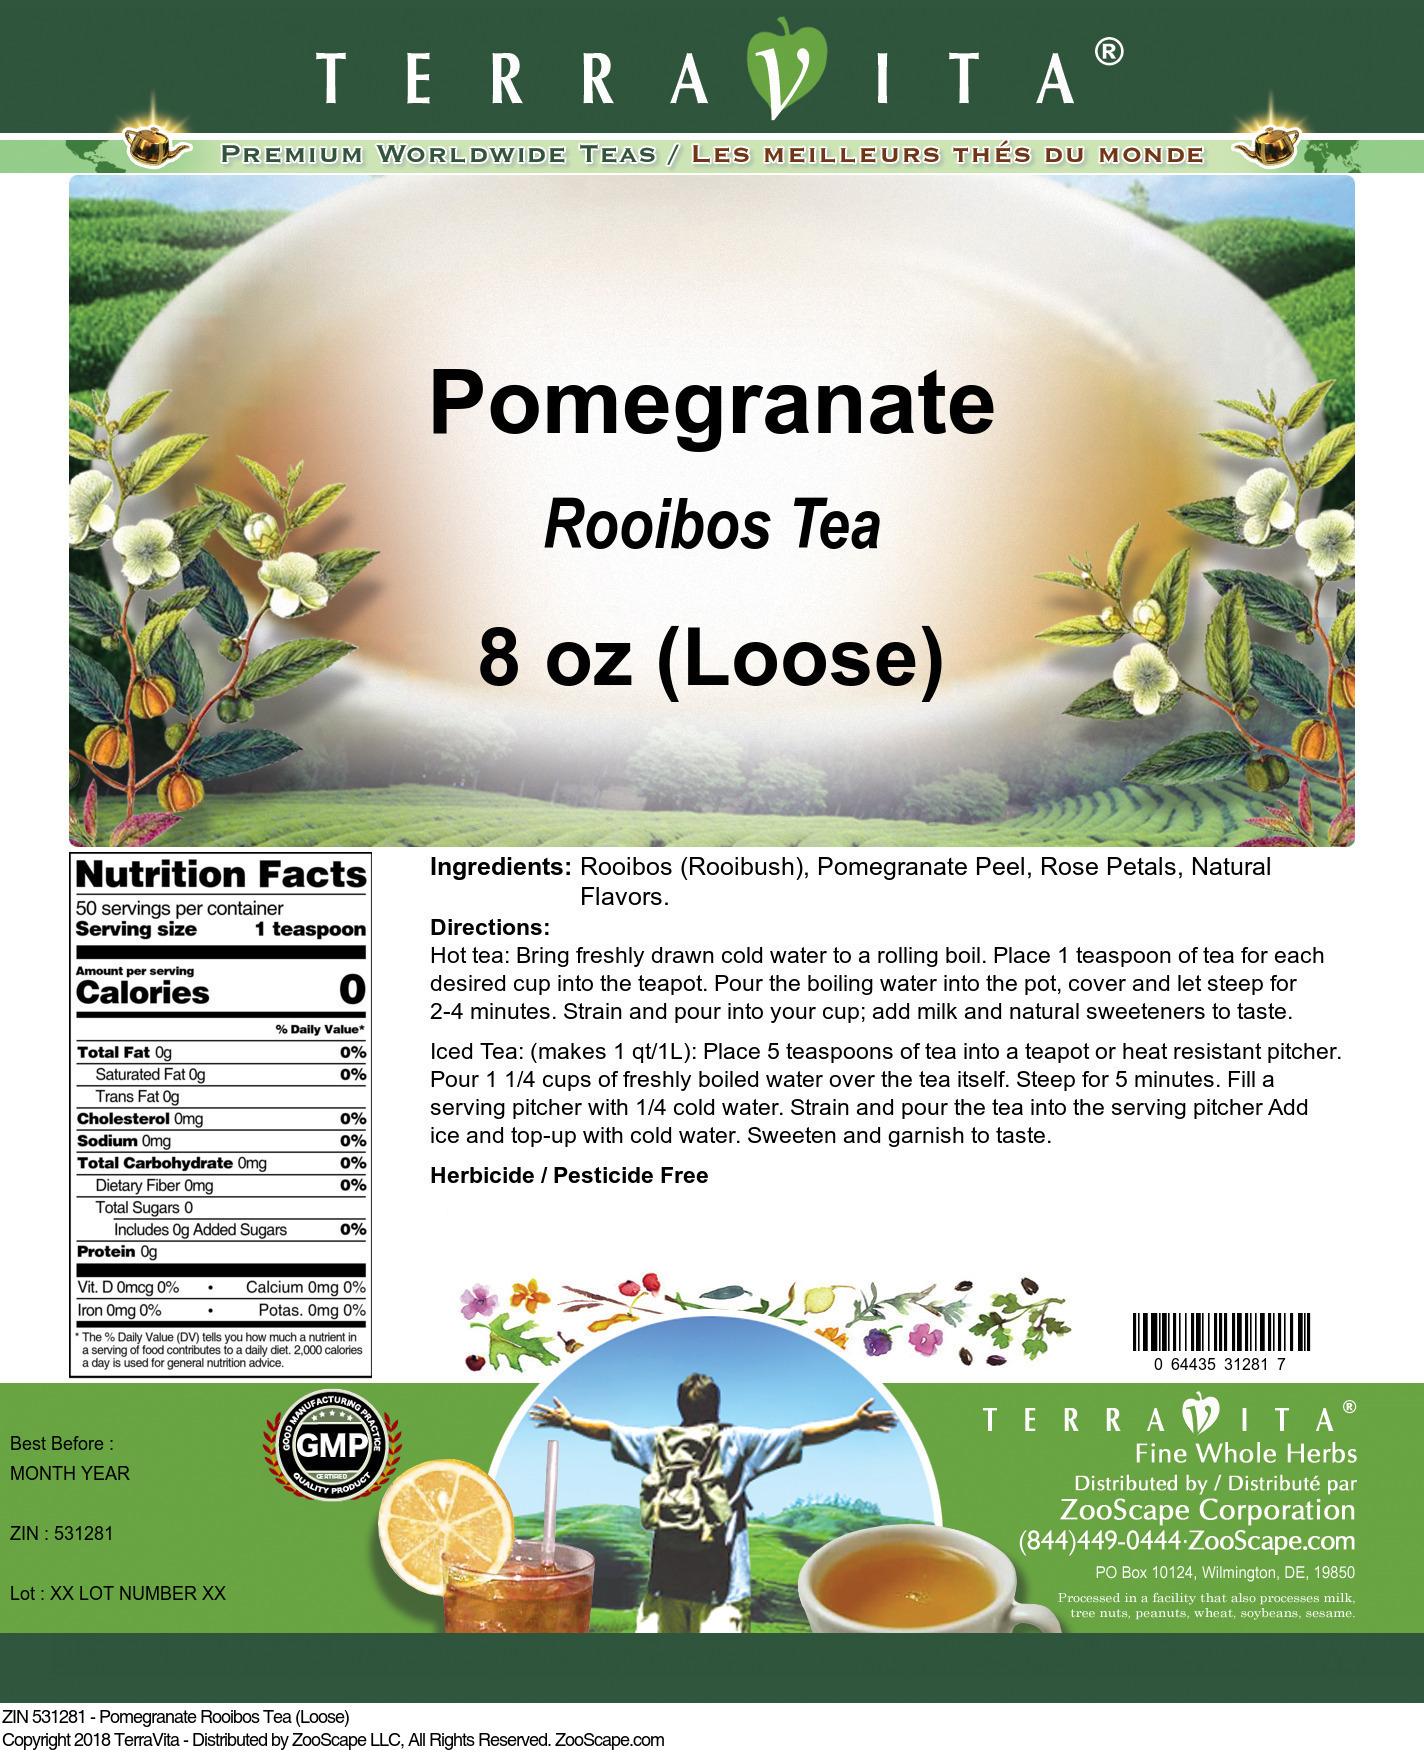 Pomegranate Rooibos Tea